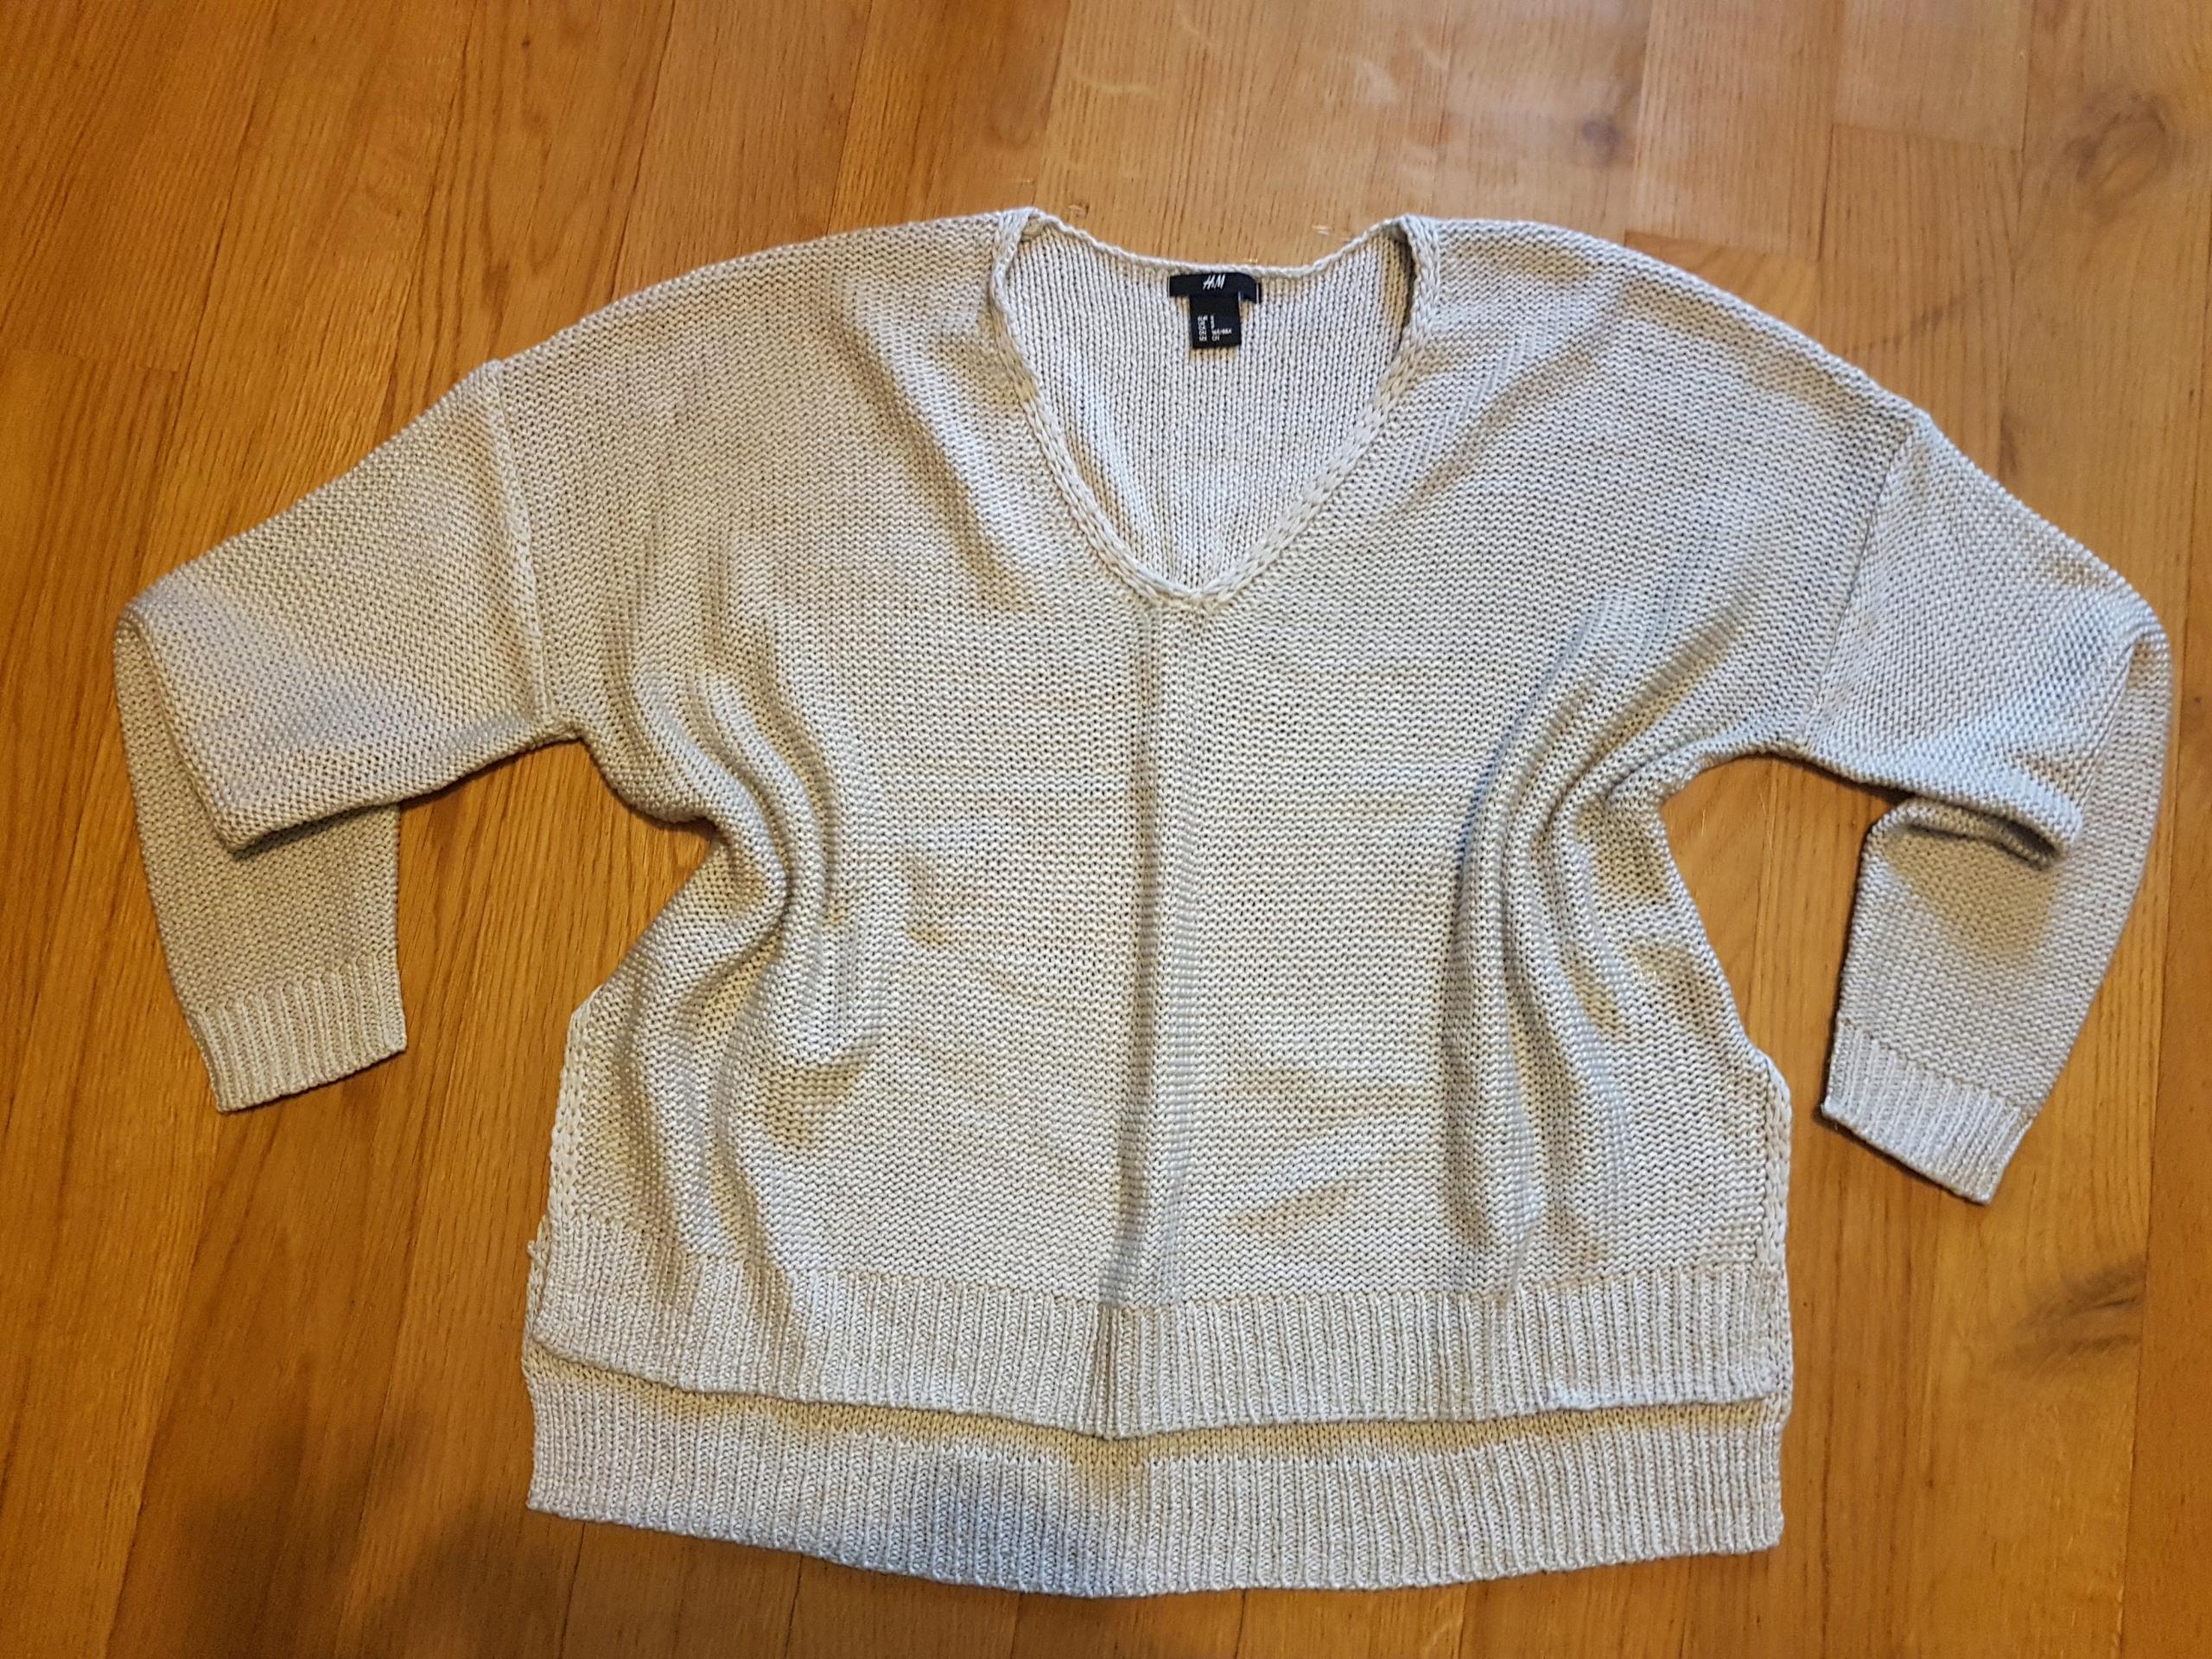 H&M 36 S sweterek rozcięcia po bokach oversize